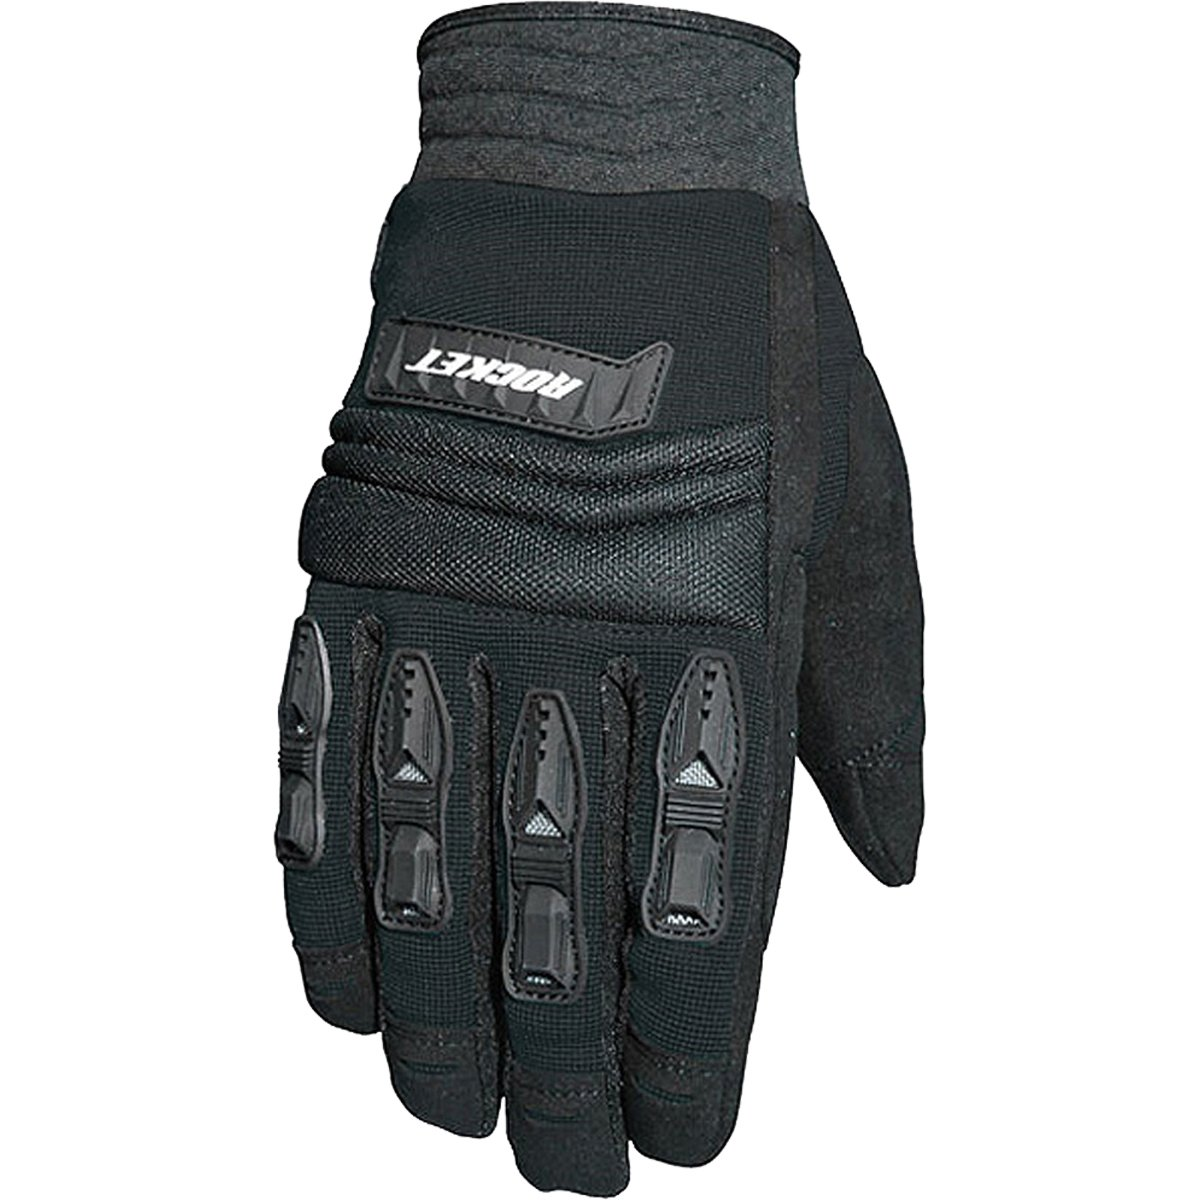 Joe Rocket Velocity Men's Textile Sports Bike Racing Motorcycle Gloves - Black/Black / 2X-Large